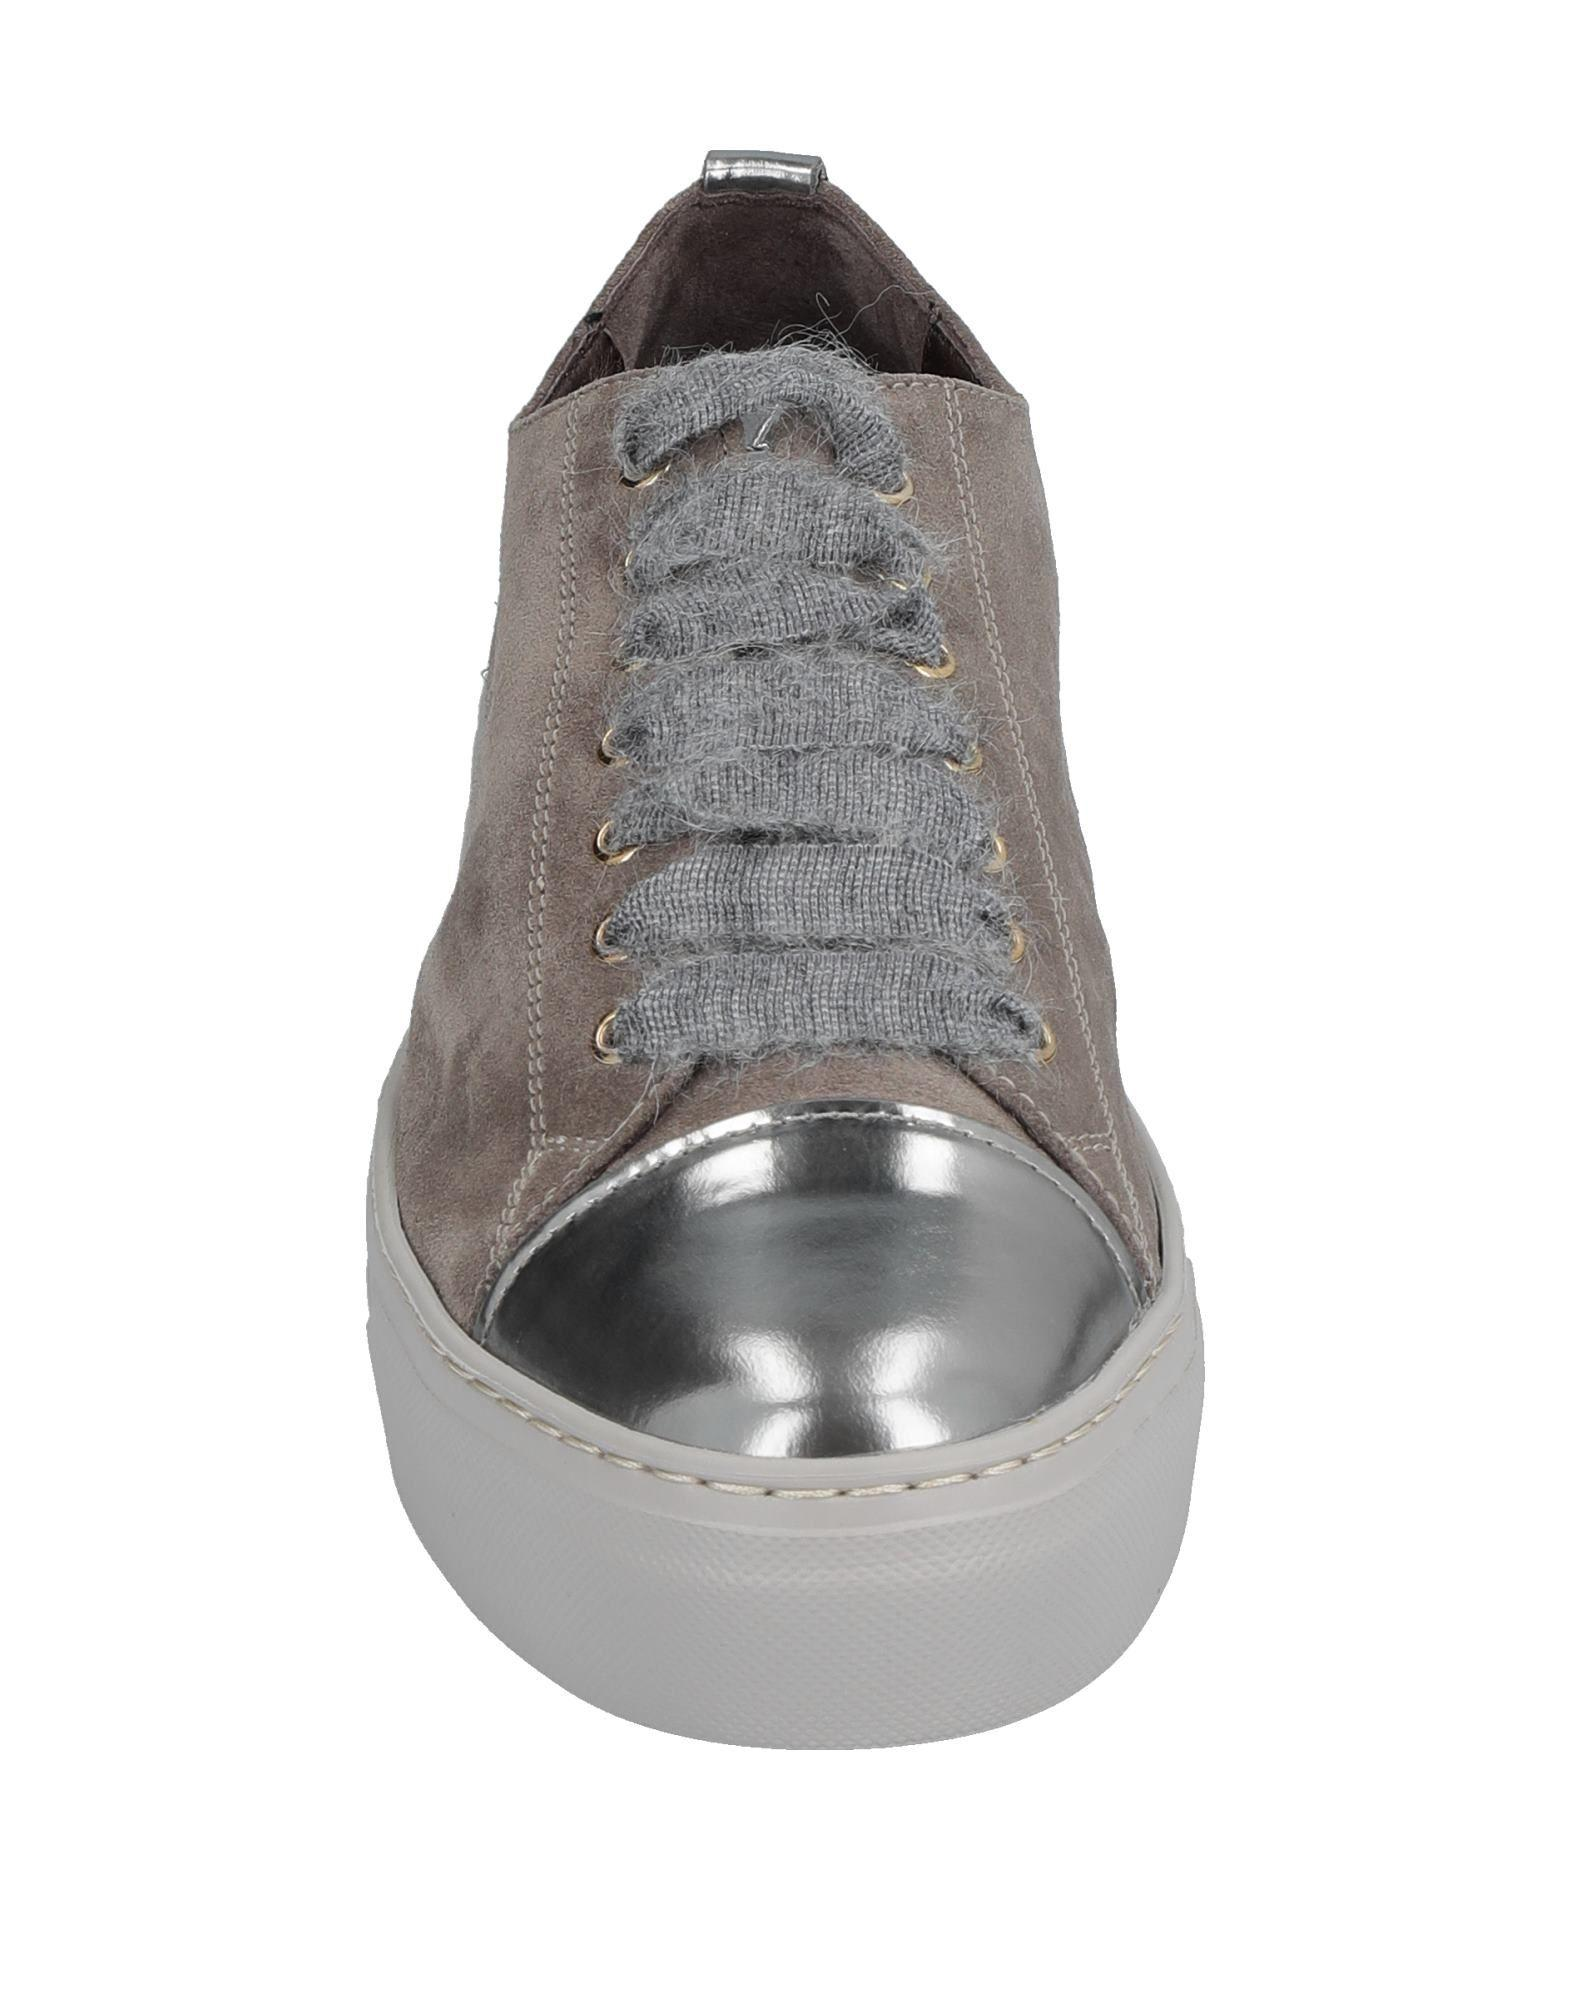 Agl Attilio Giusti Leombruni Suede Low-tops & Sneakers in Grey